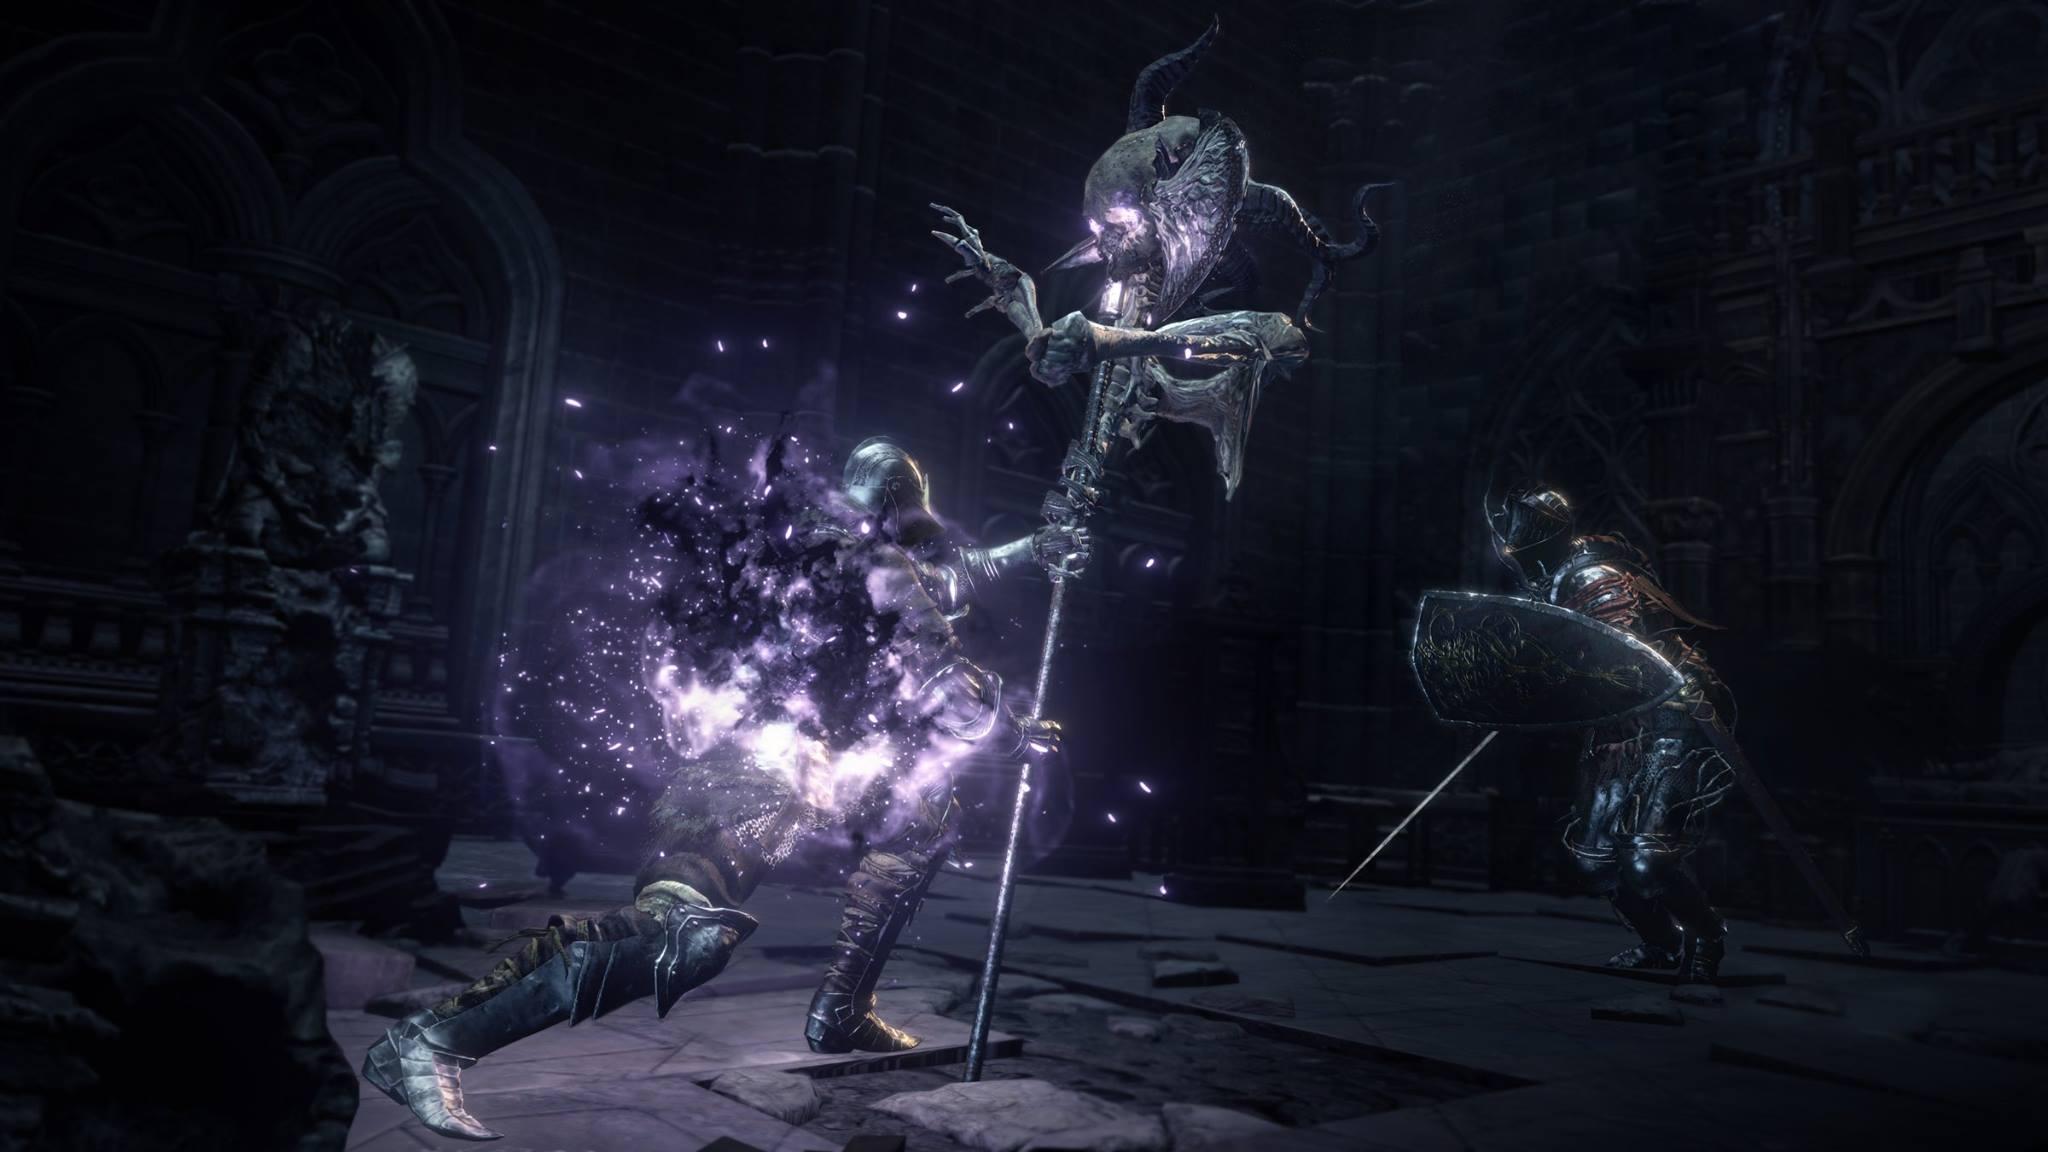 Dark Souls Ringed City Dlc